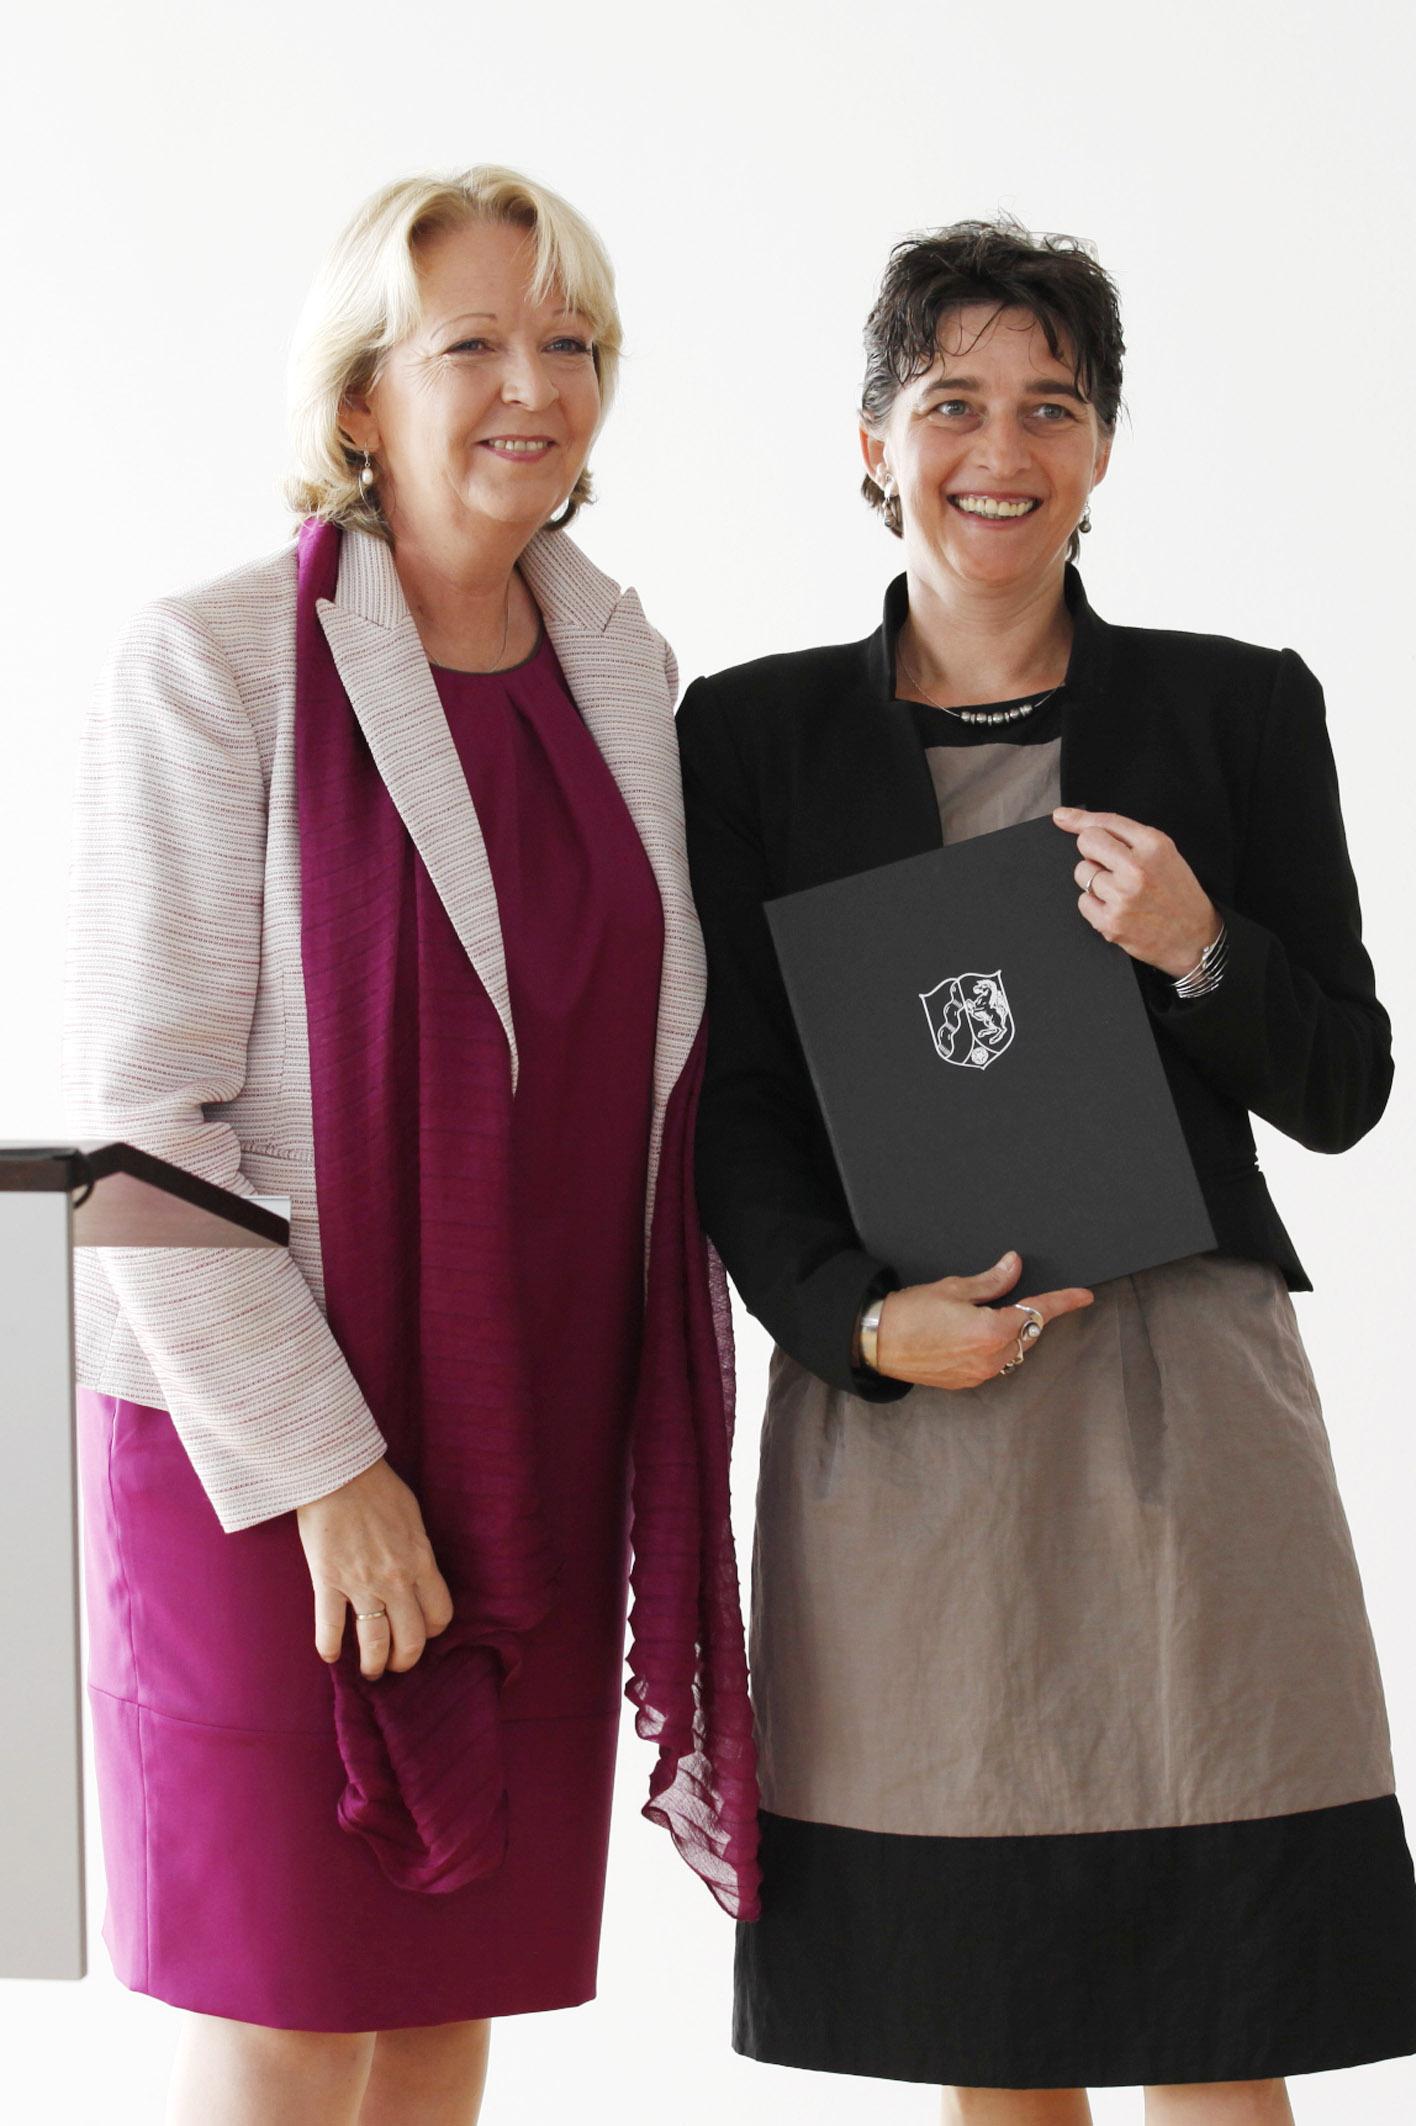 Barbara Steffens mit Ministerpräsidentin Hannelore Kraft. FOTO: ©MGEPA/Sondermann